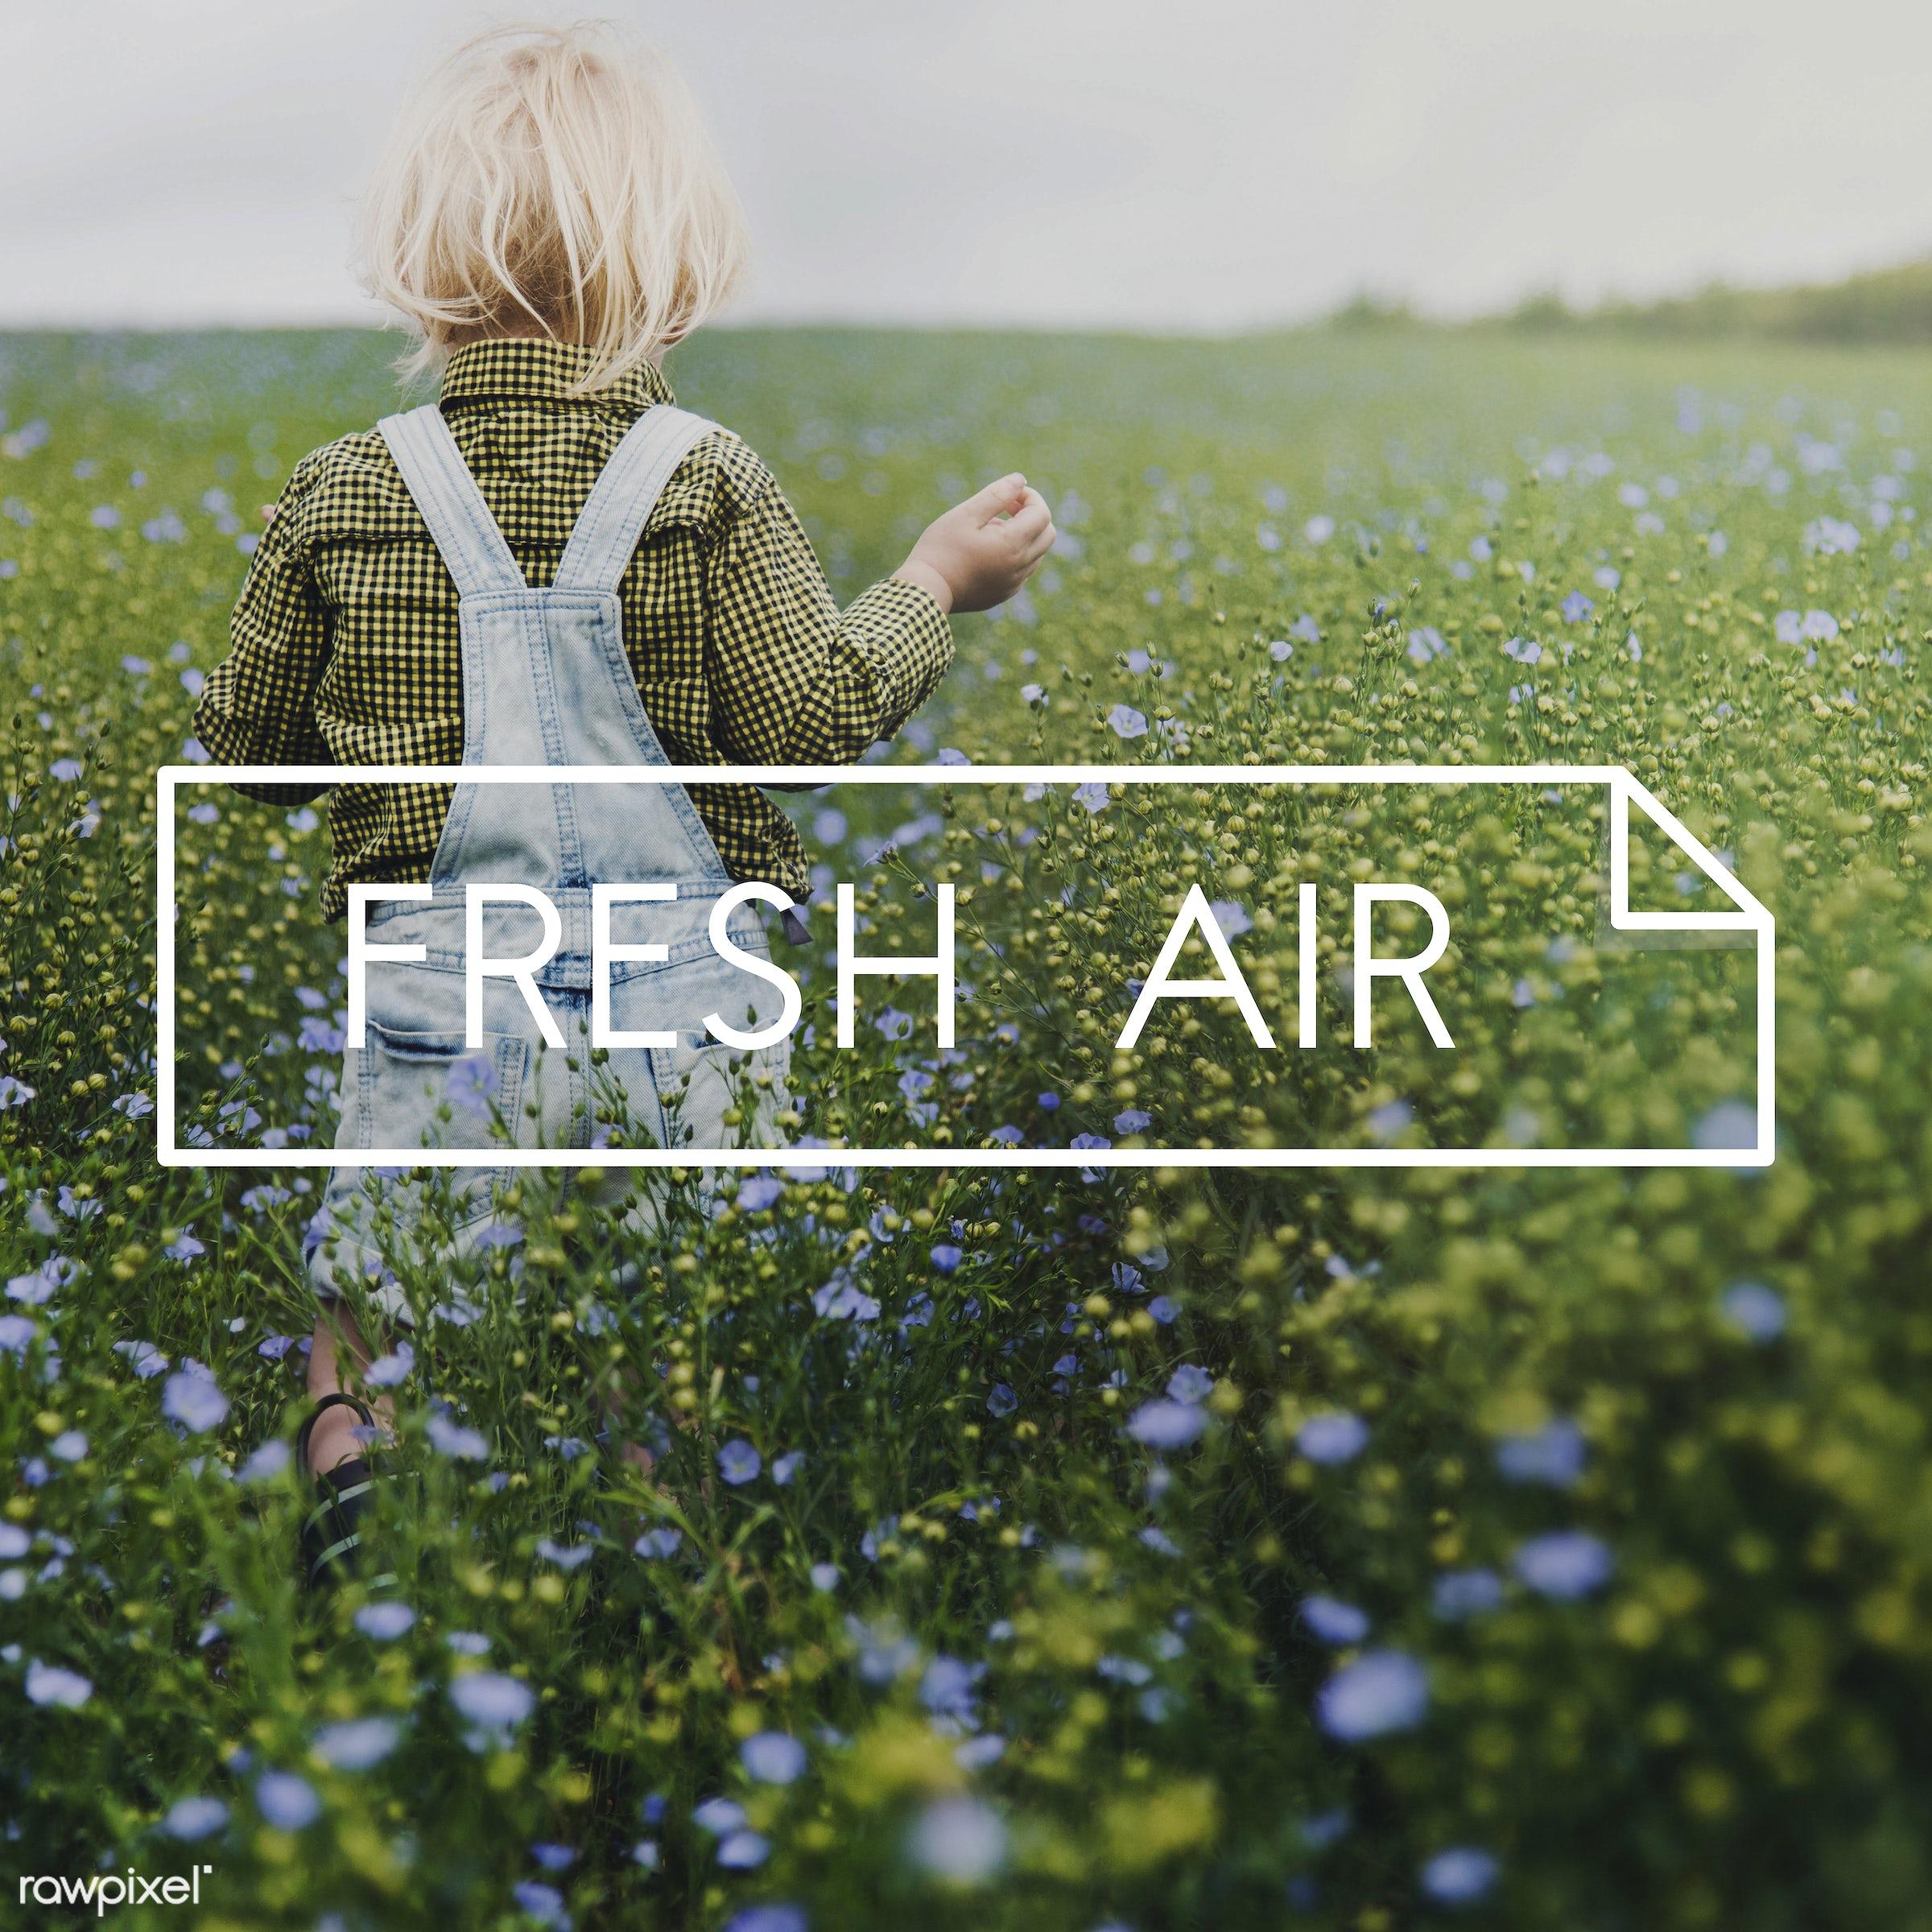 spring, adorable, badge, banner, blonde, boy, caucasian, childhood, dungarees, enjoyment, environment, flower garden,...